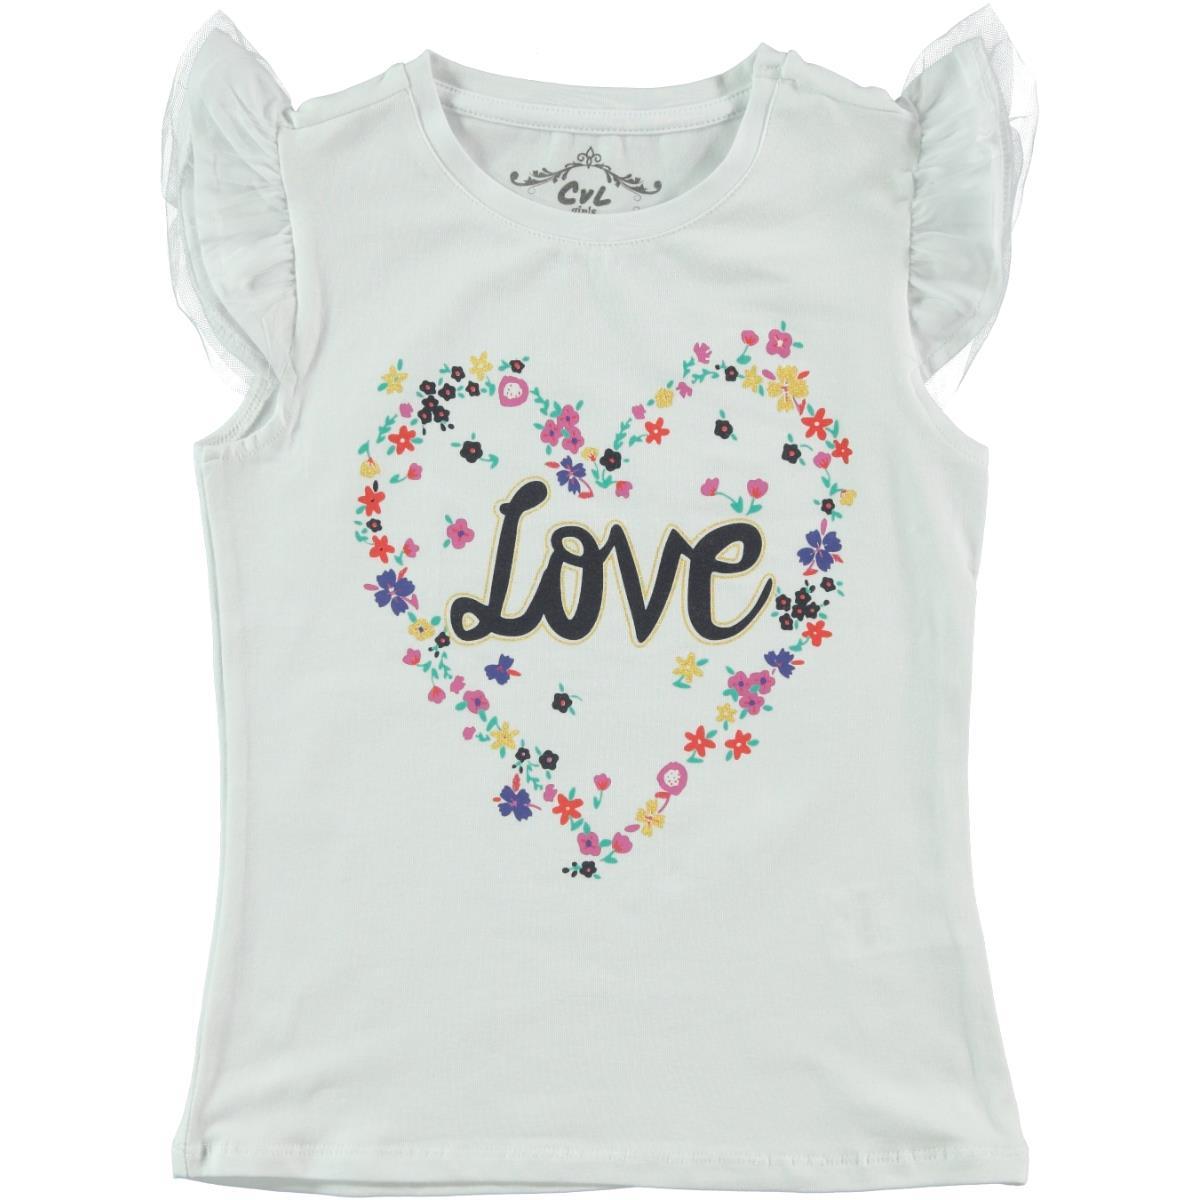 Cvl Kids Girl T-Shirt 6-9 Years Old, White